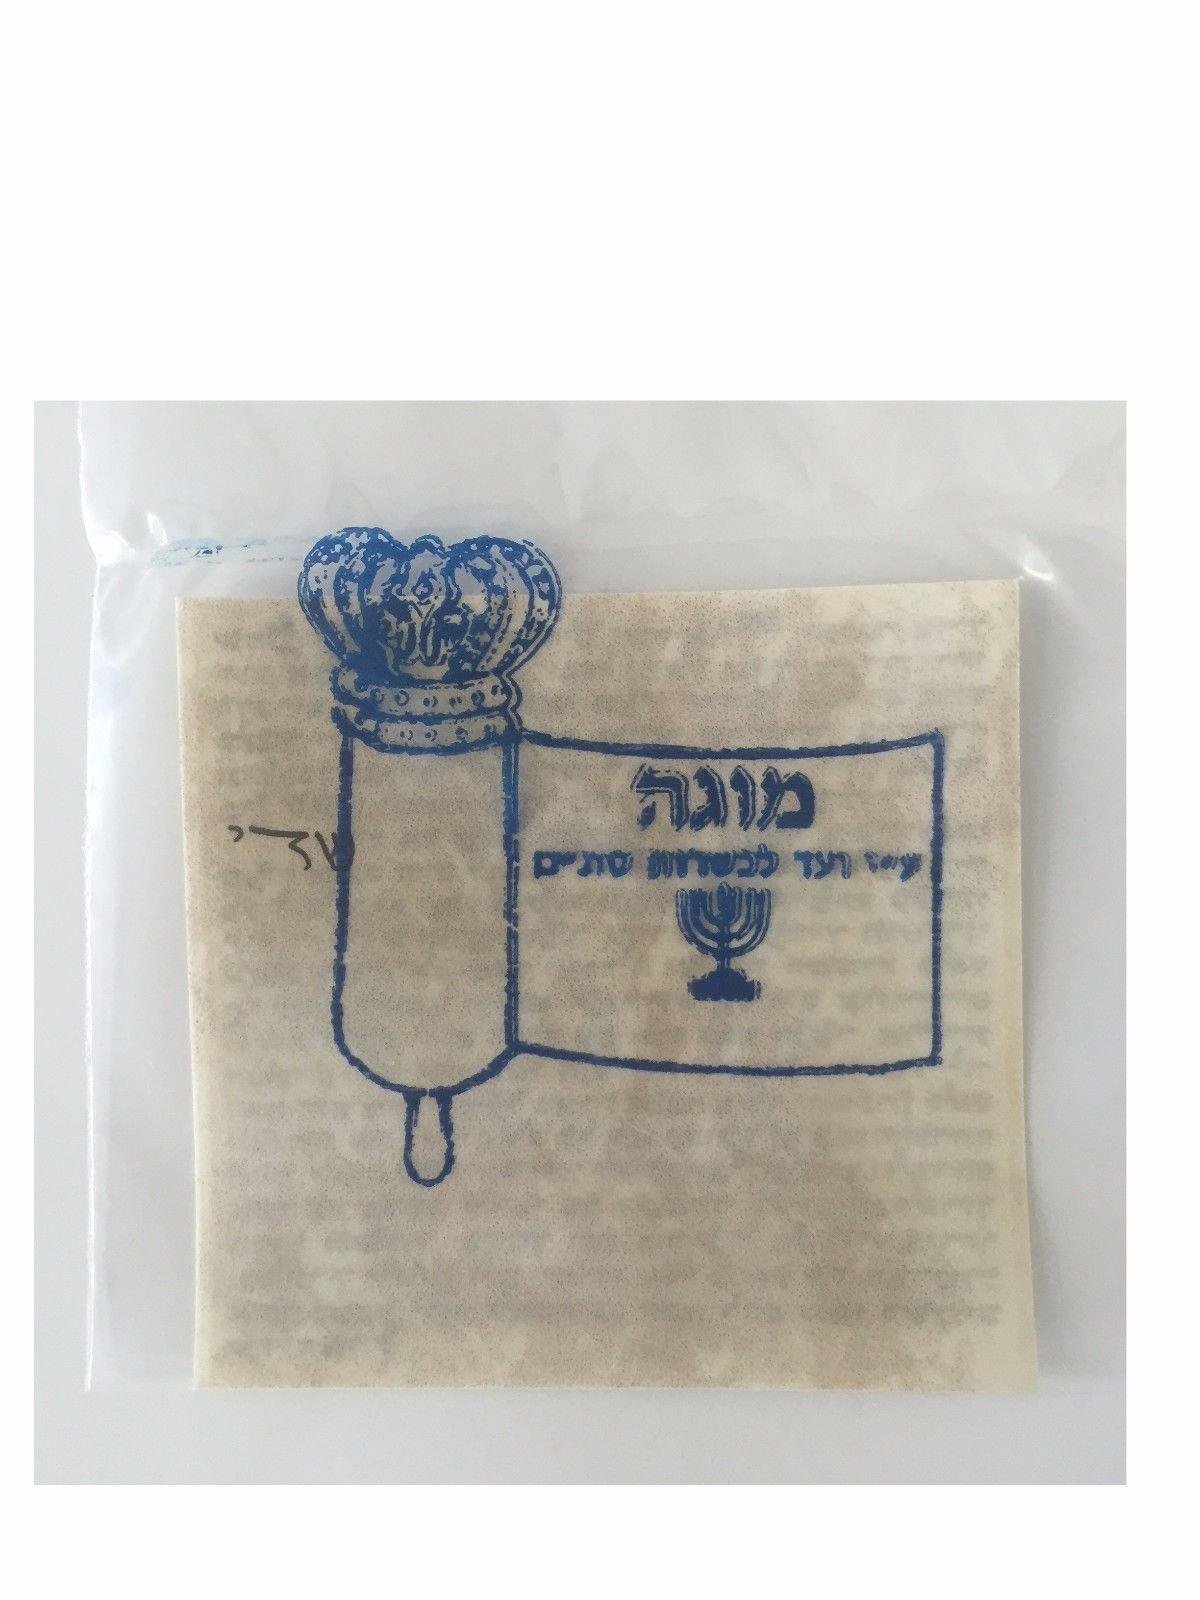 Alef Judaica Top Quality Kosher Mehadrin Mezuzah Scroll Parchment Klaff - 2.5 X 2.5 Inches